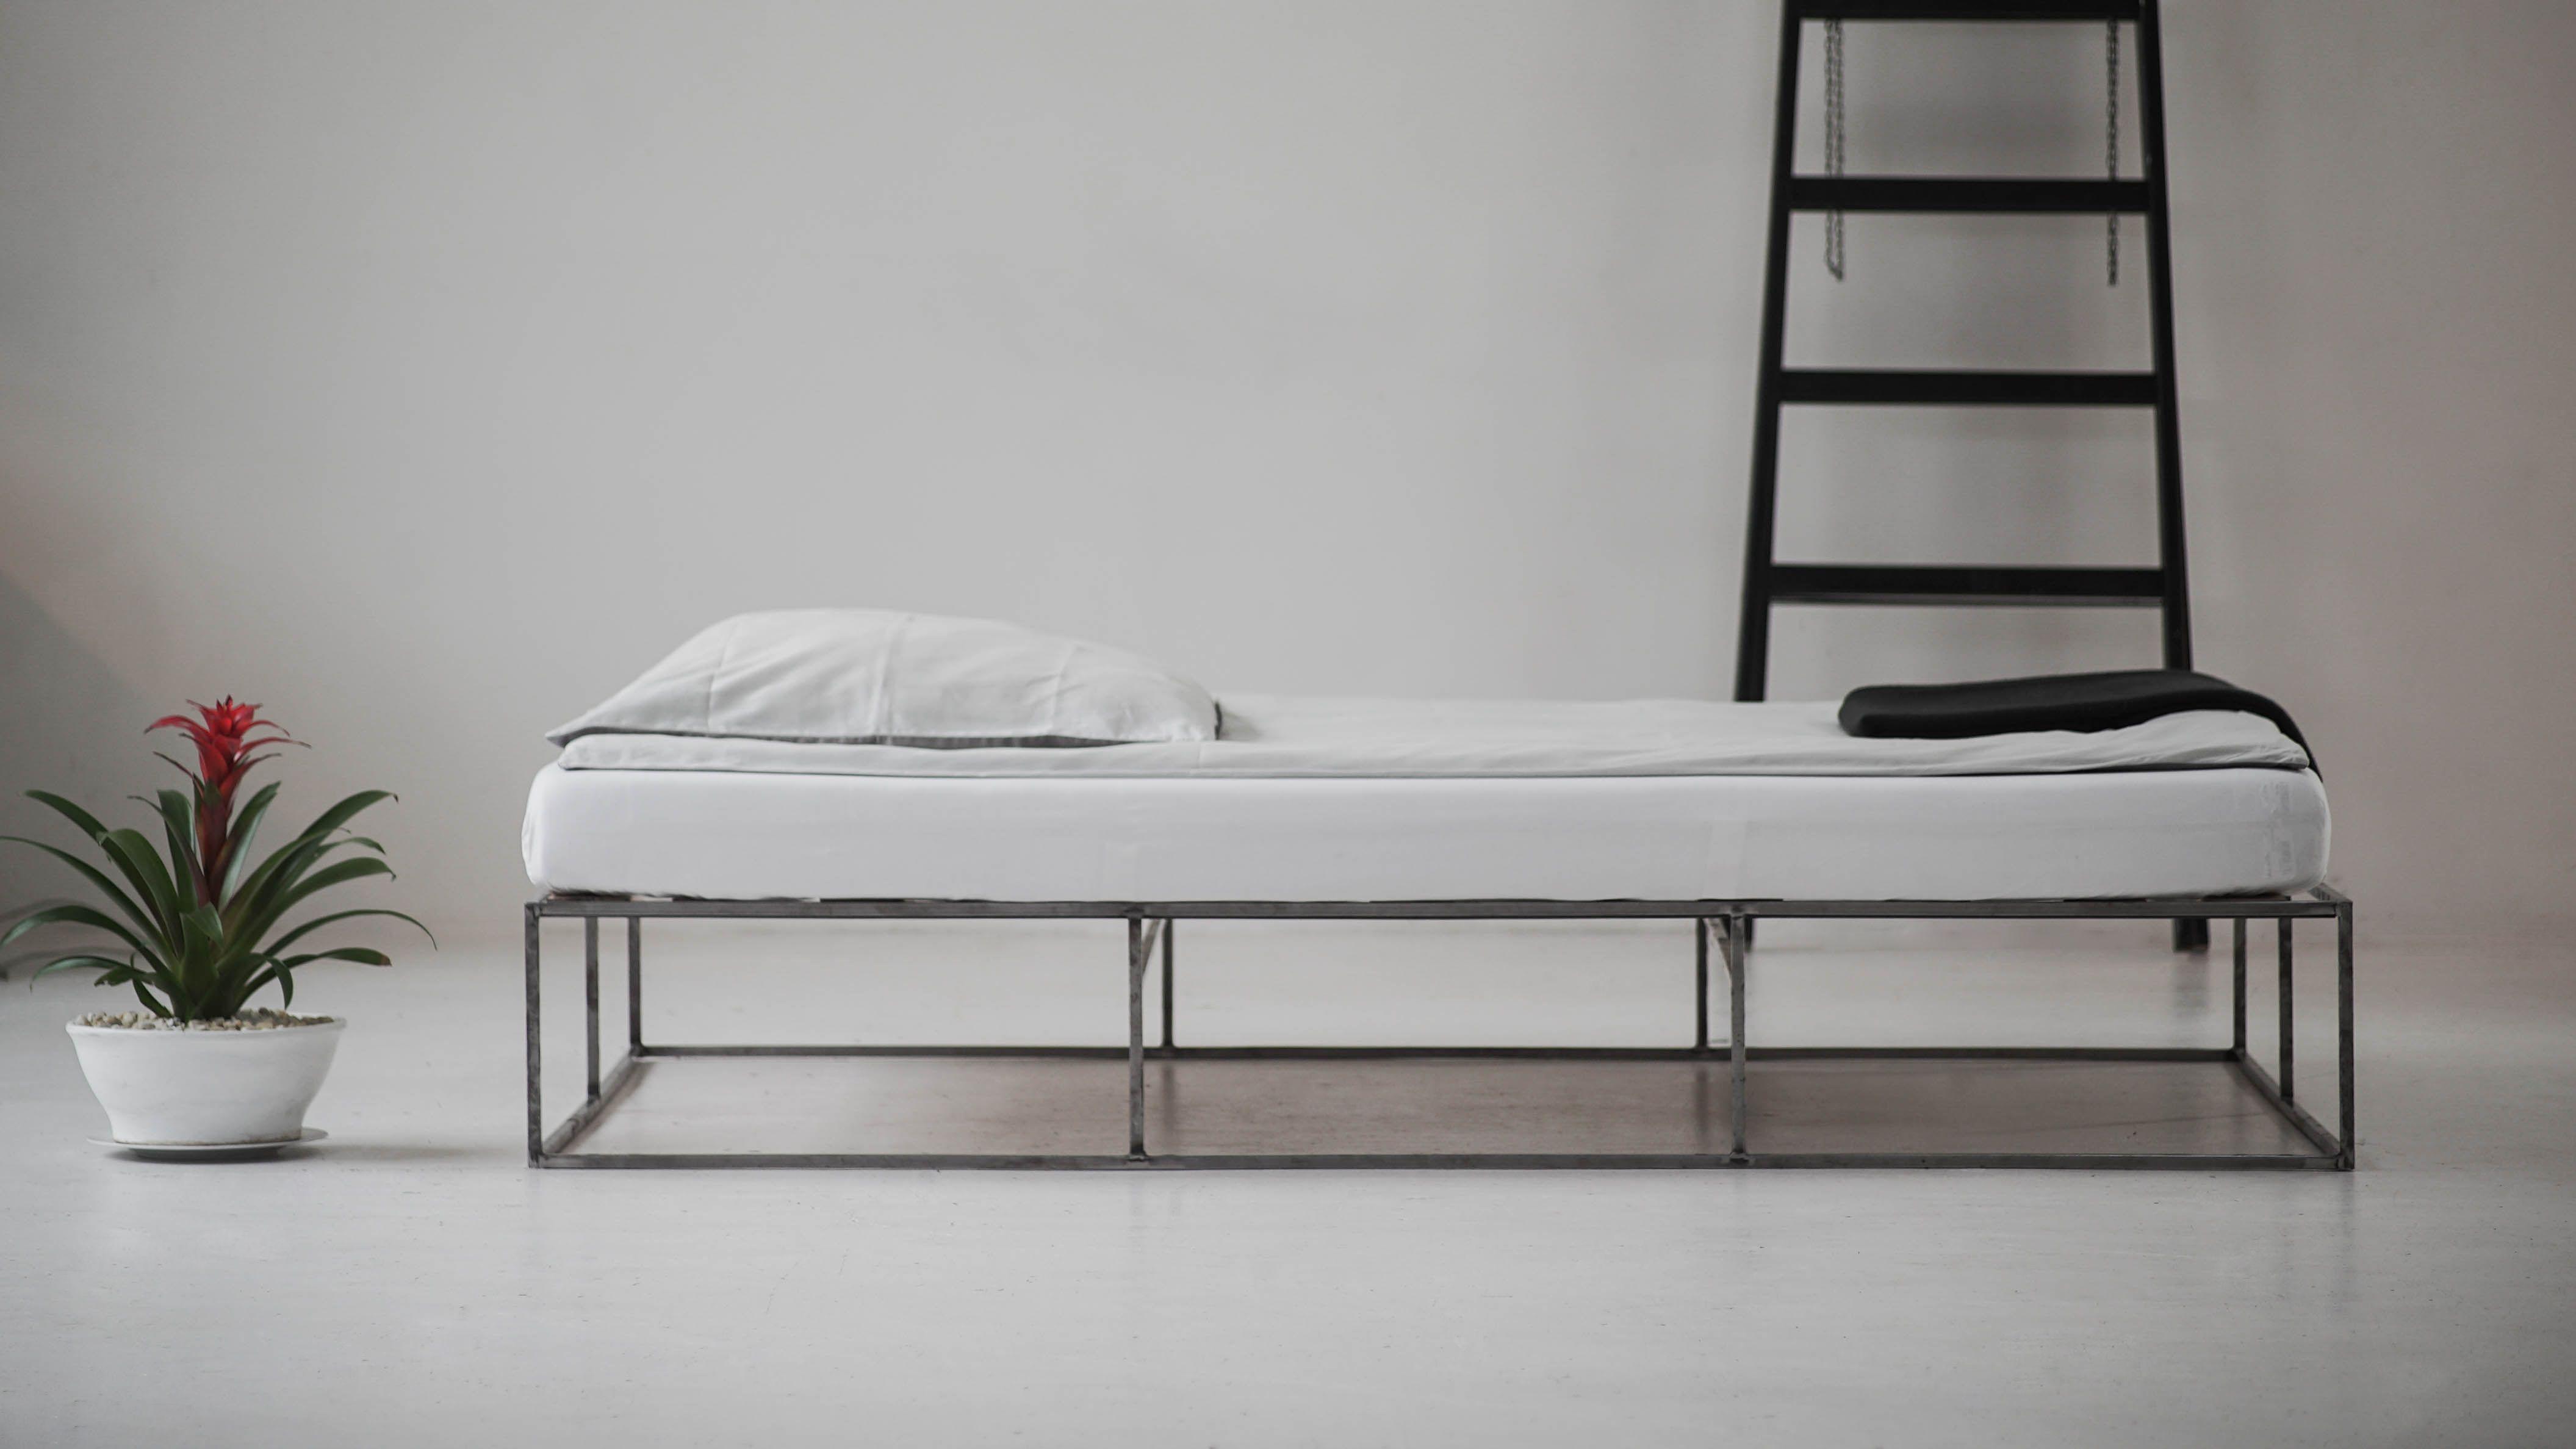 Bildergalerie des Metallbetts ION aus Berlin Bett ideen